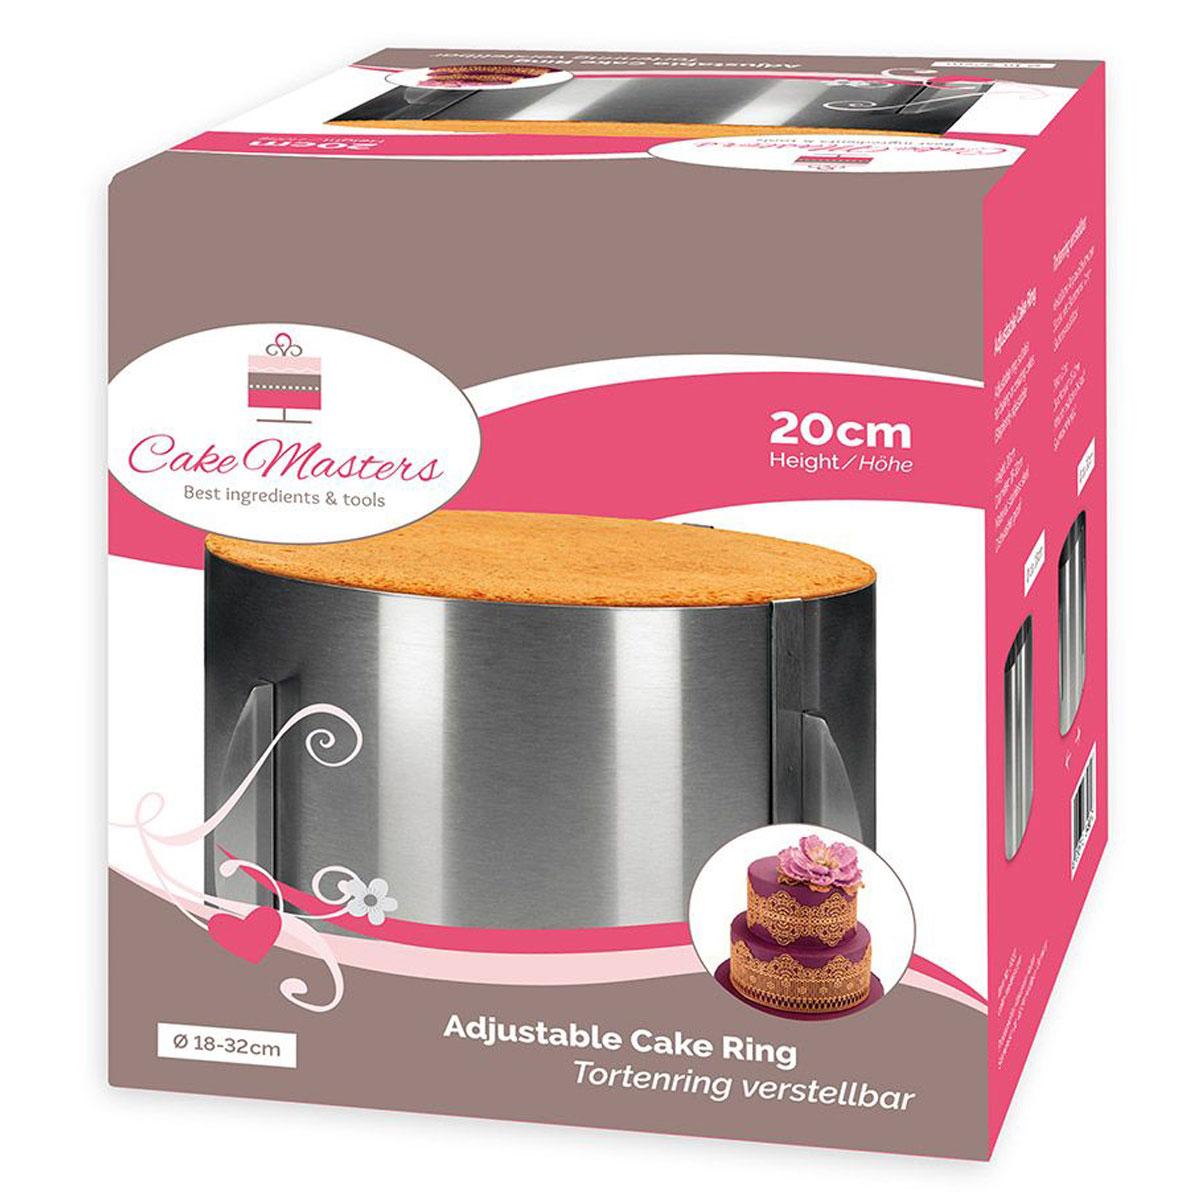 Cake Masters Tortenring 18-32cm - 20cm hoch